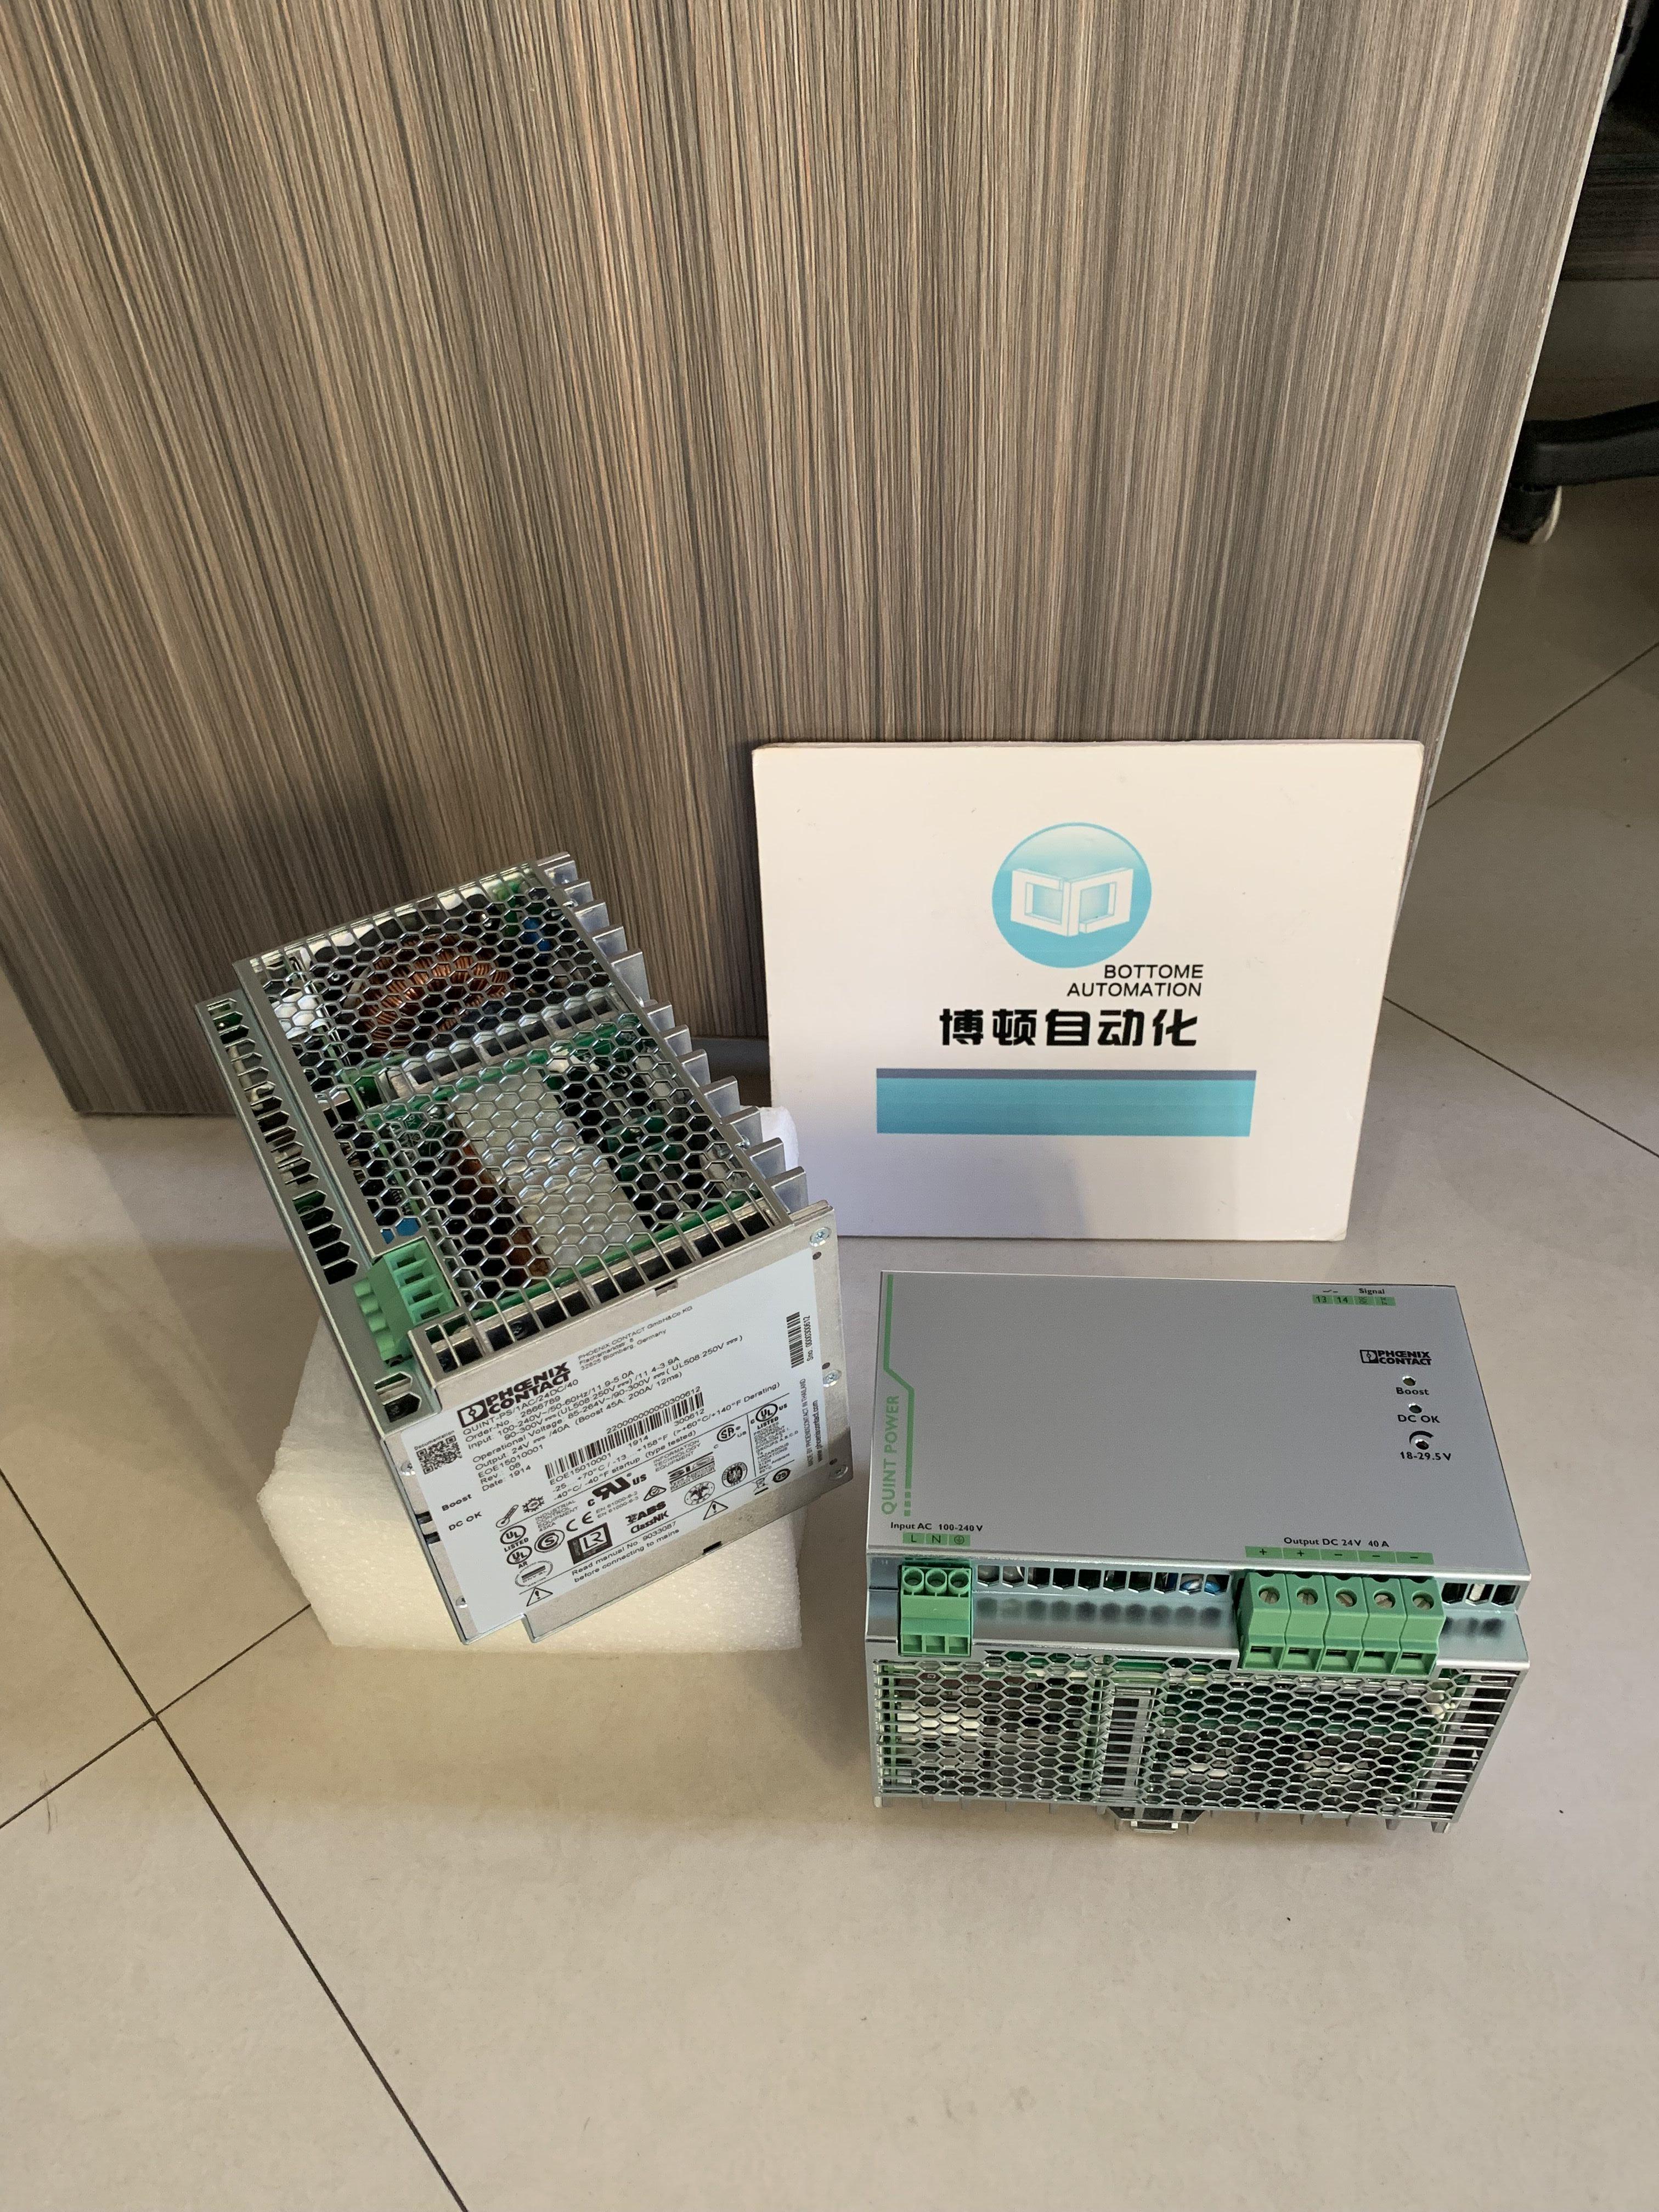 24dc-FS-Power Modulo; 2885359 Phoenix CONTACT EMD-SL-PS